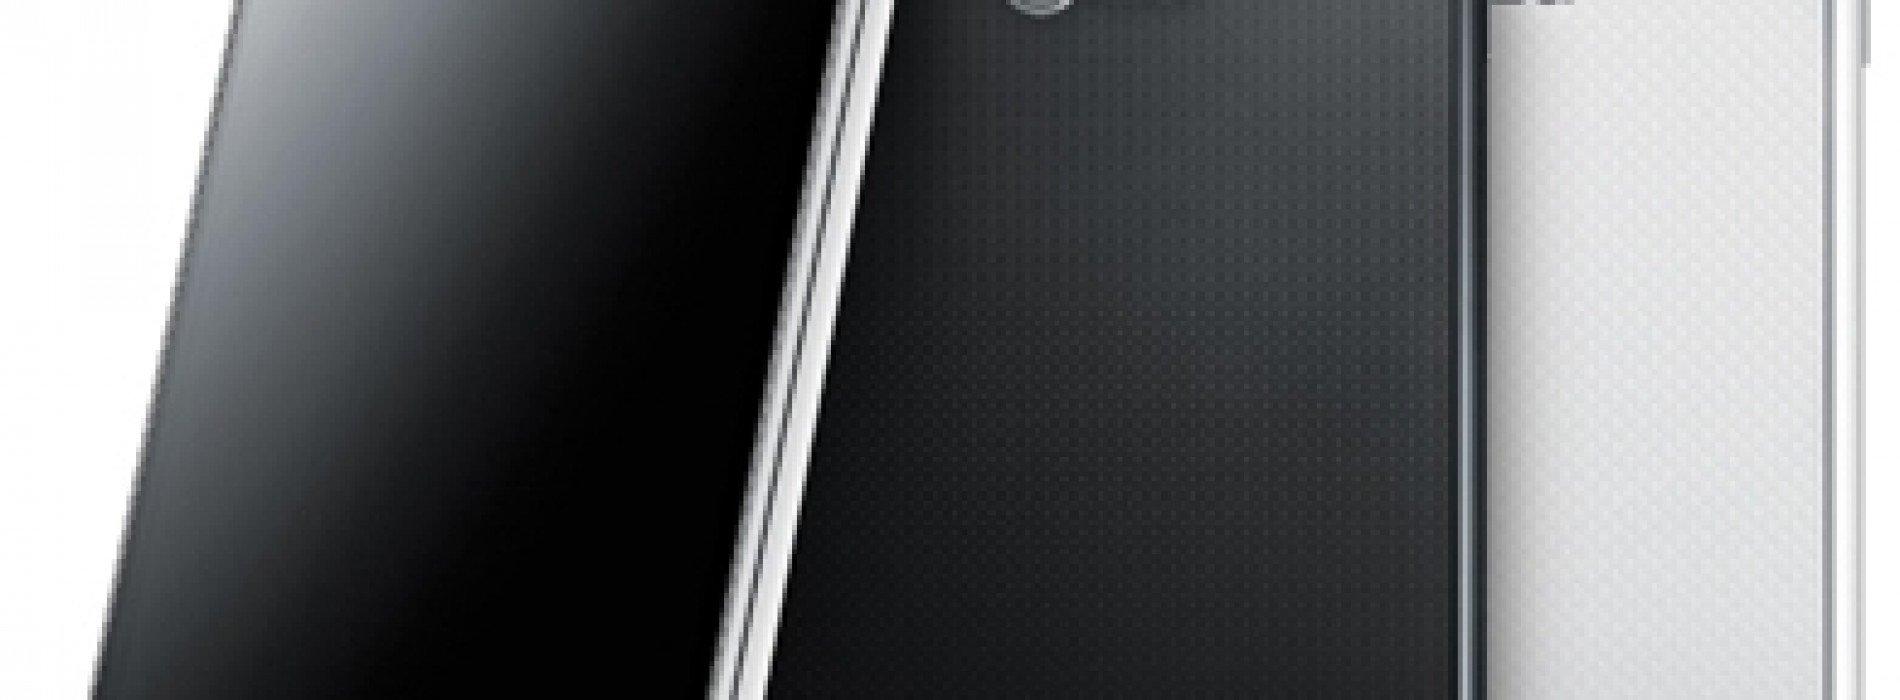 LG Optimus G2 may have a 5.5-inch, 1080p display